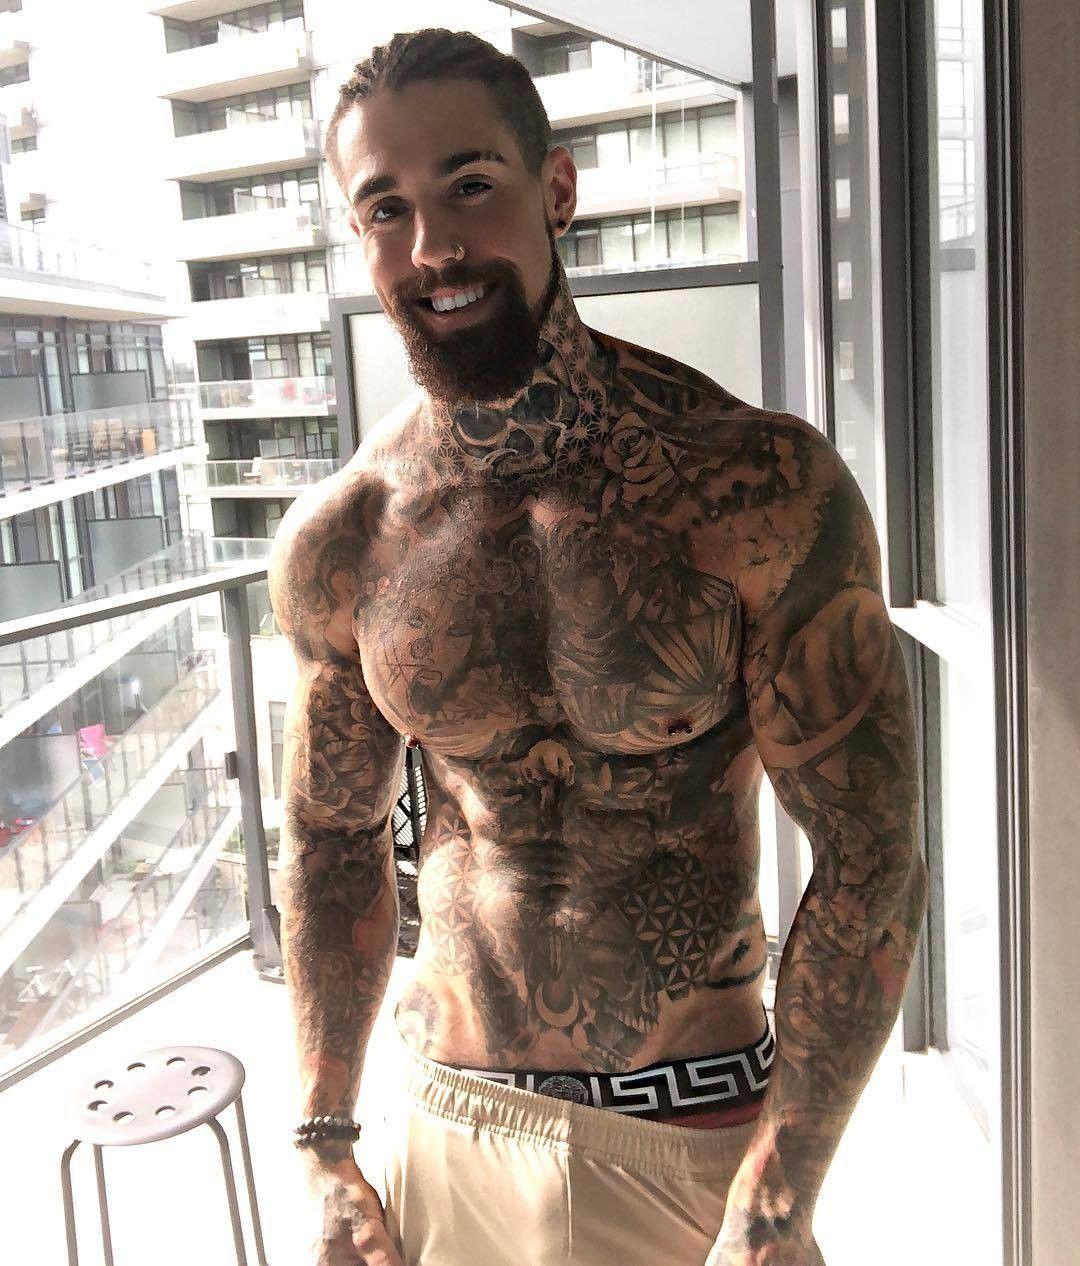 Gay penis tattoo